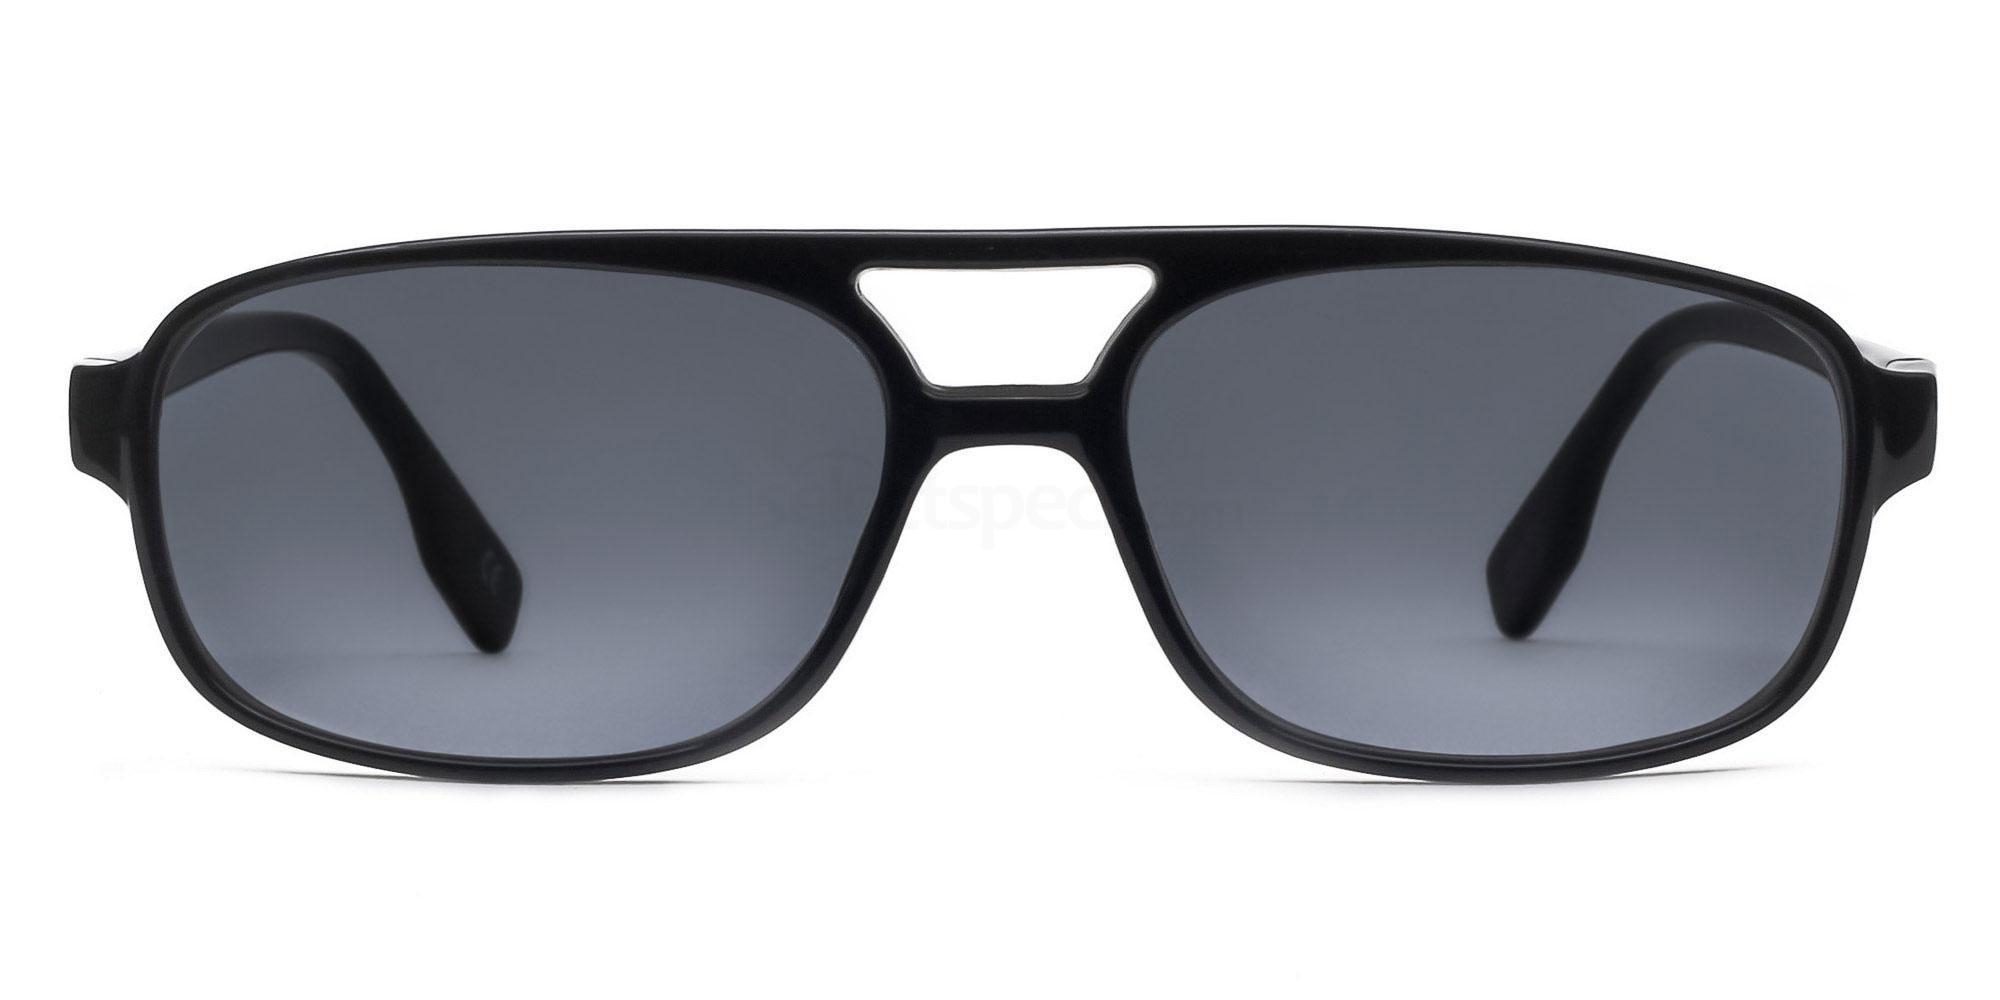 C01 Dark Grey P2395 - Black (Sunglasses) Sunglasses, Savannah